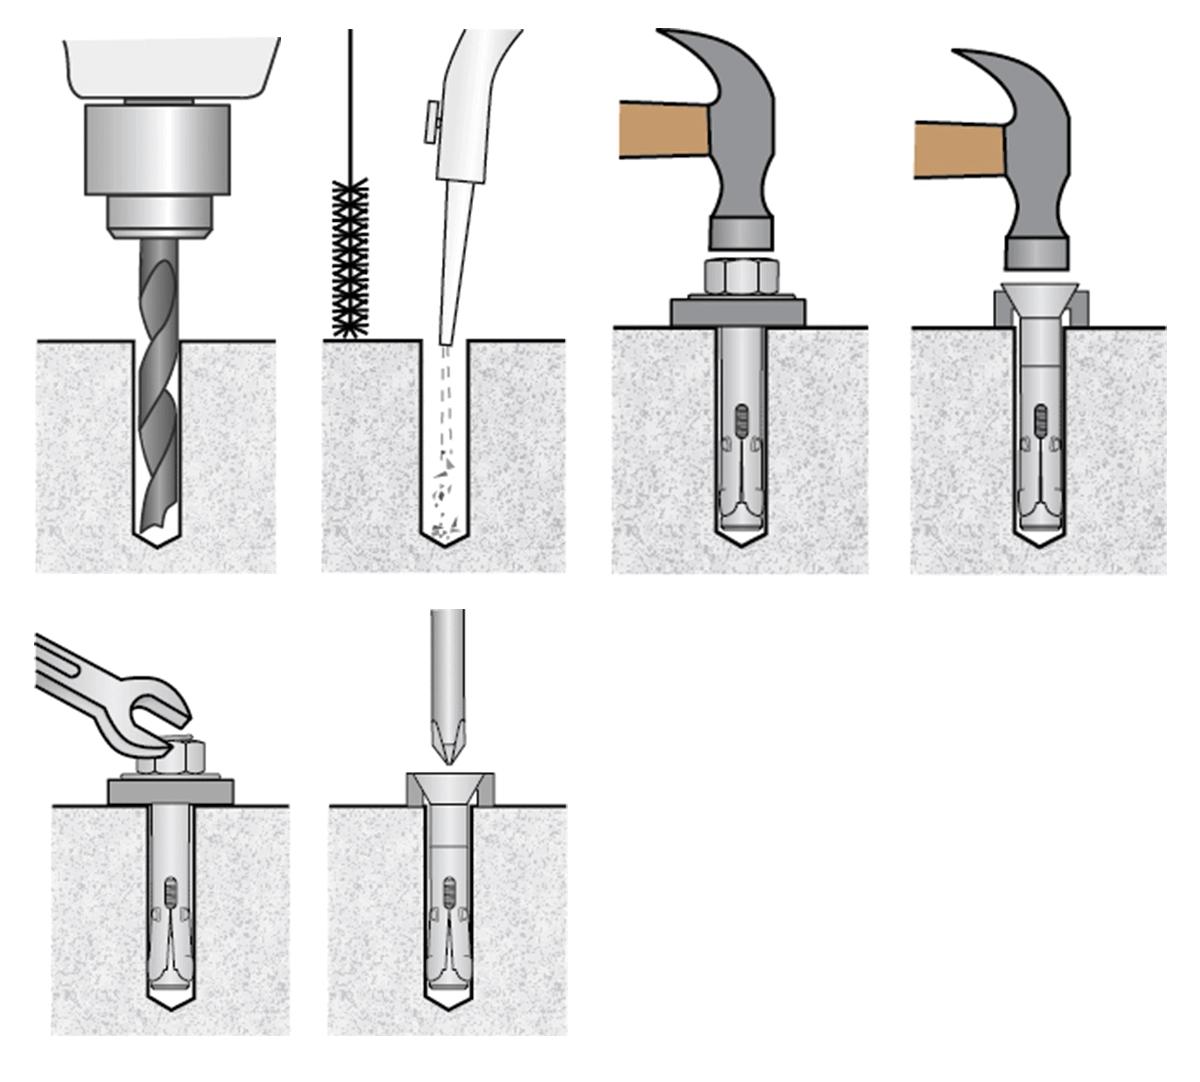 sleeve anchor installation instructions